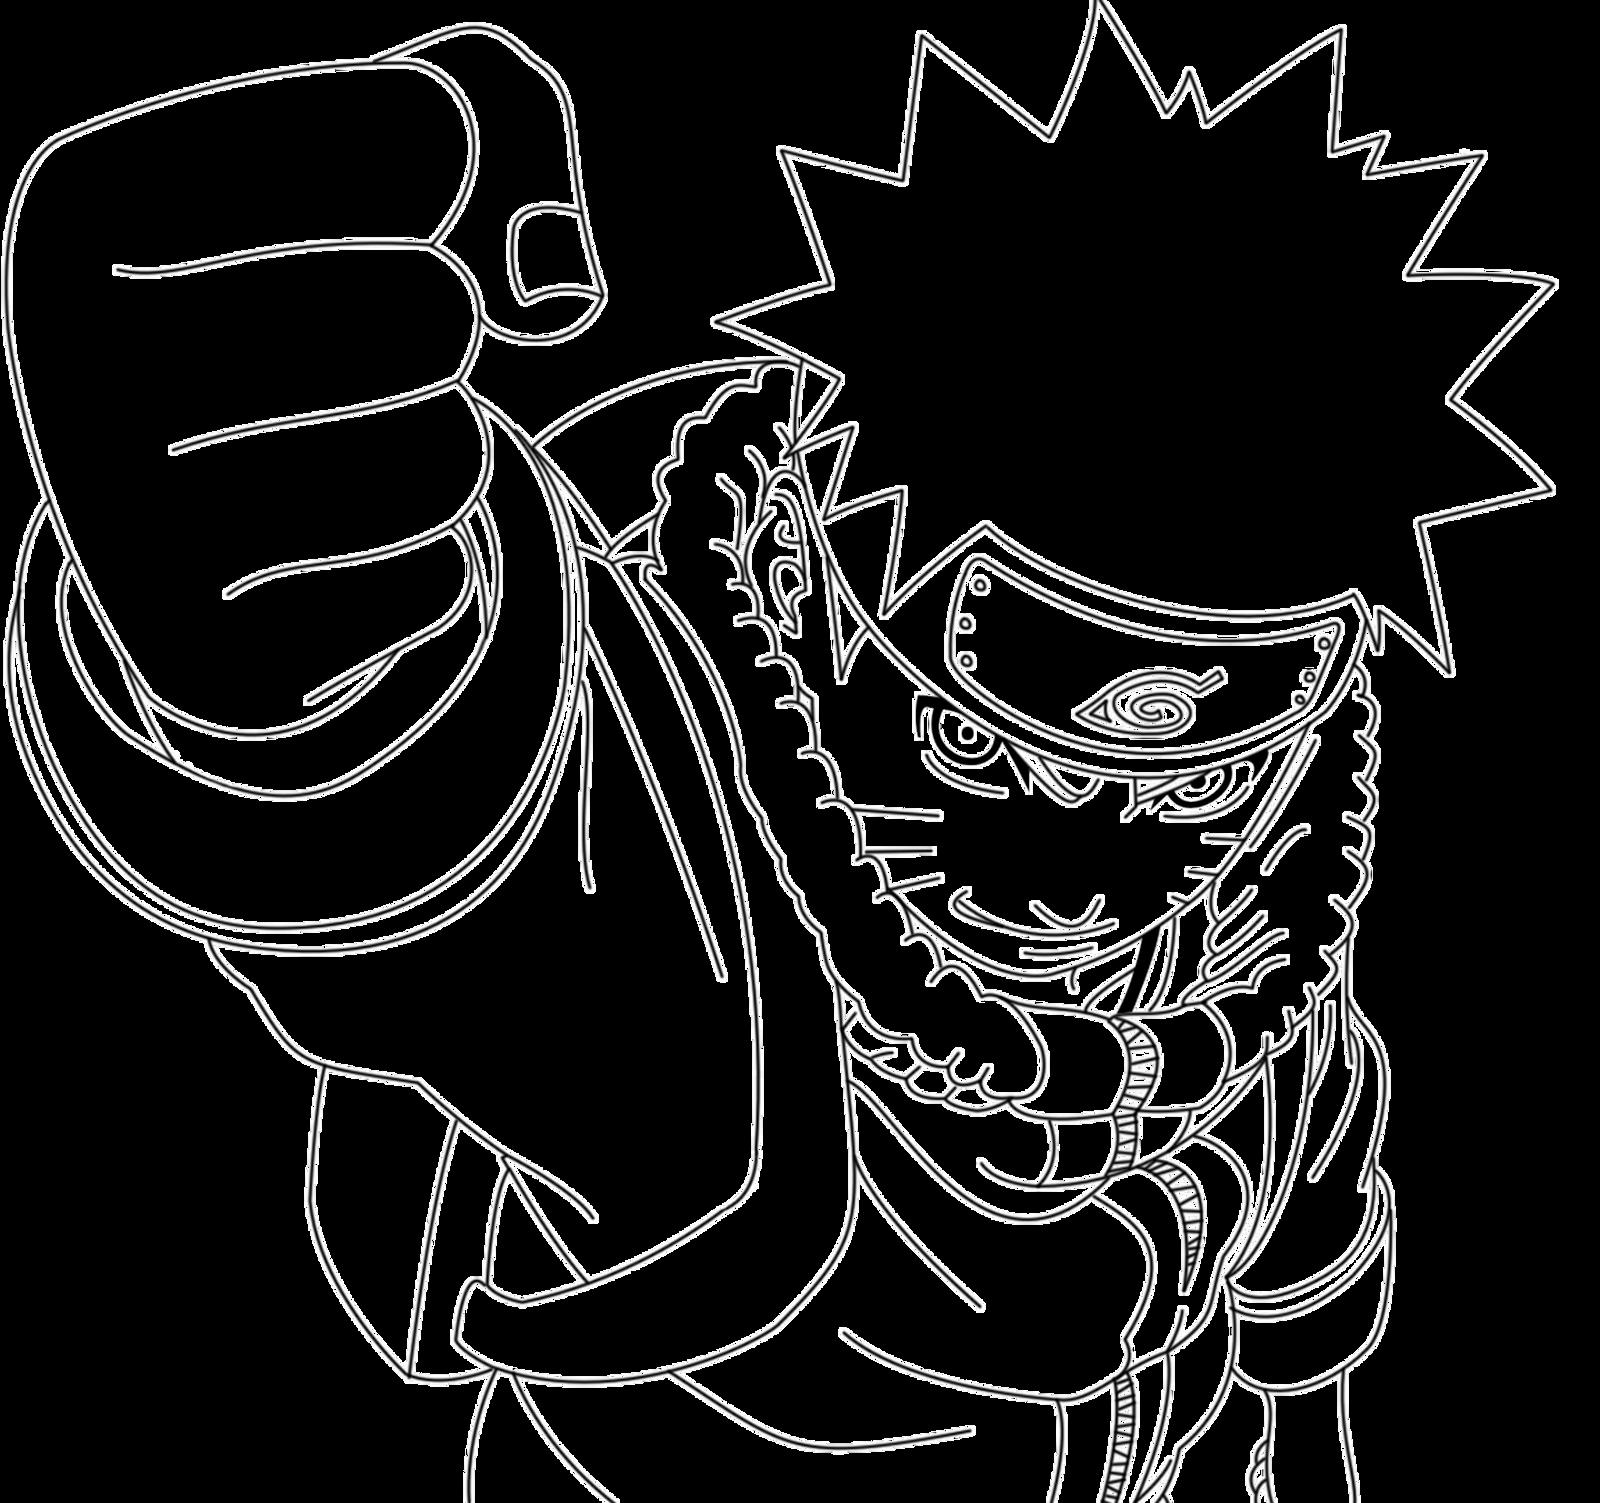 Lineart Naruto : Naruto kid lineart by crazylz on deviantart